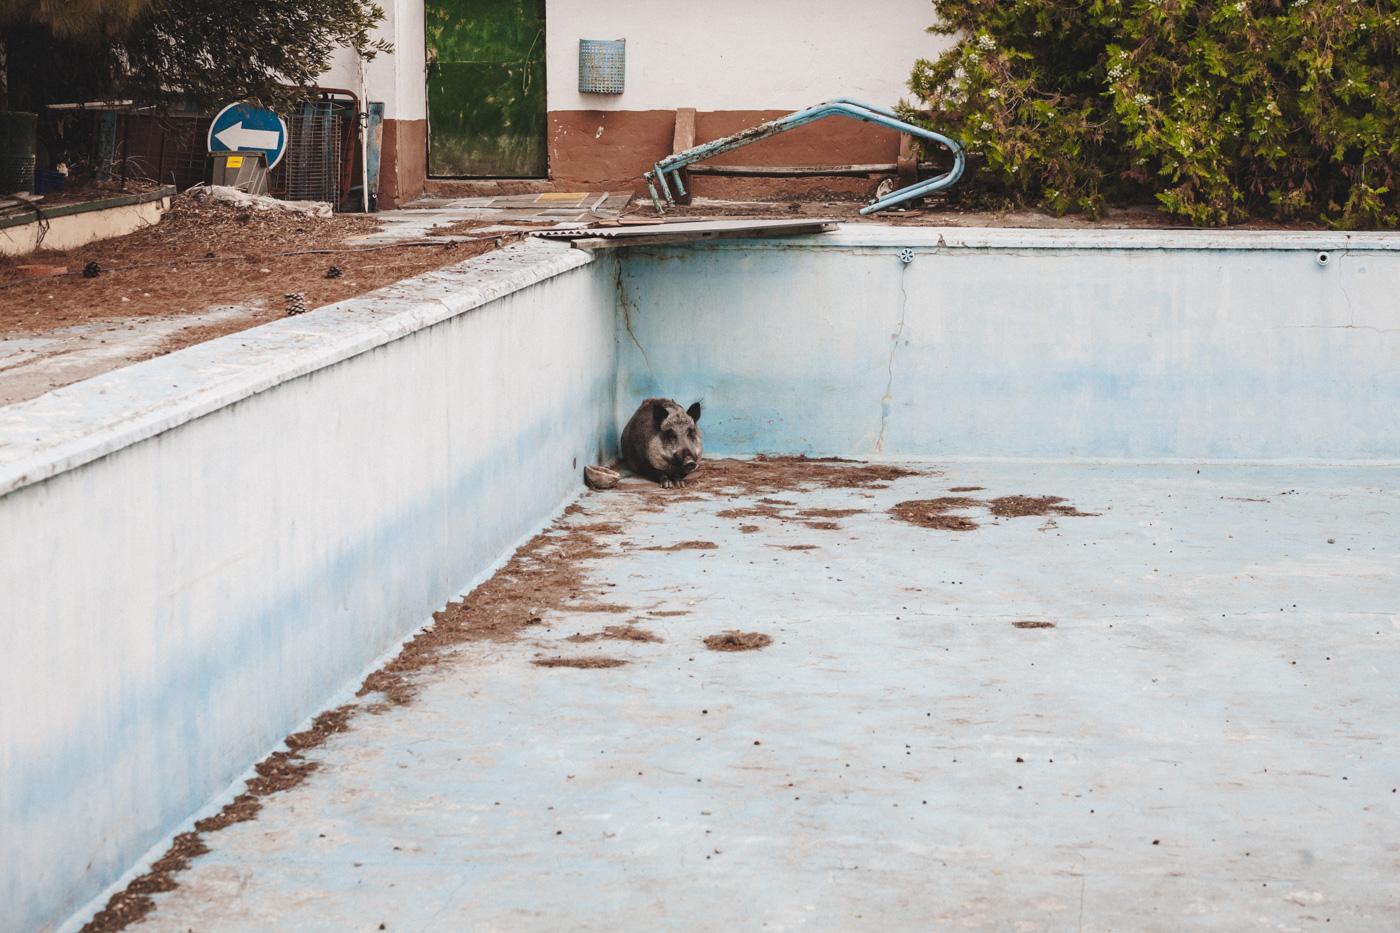 jabali en piscina